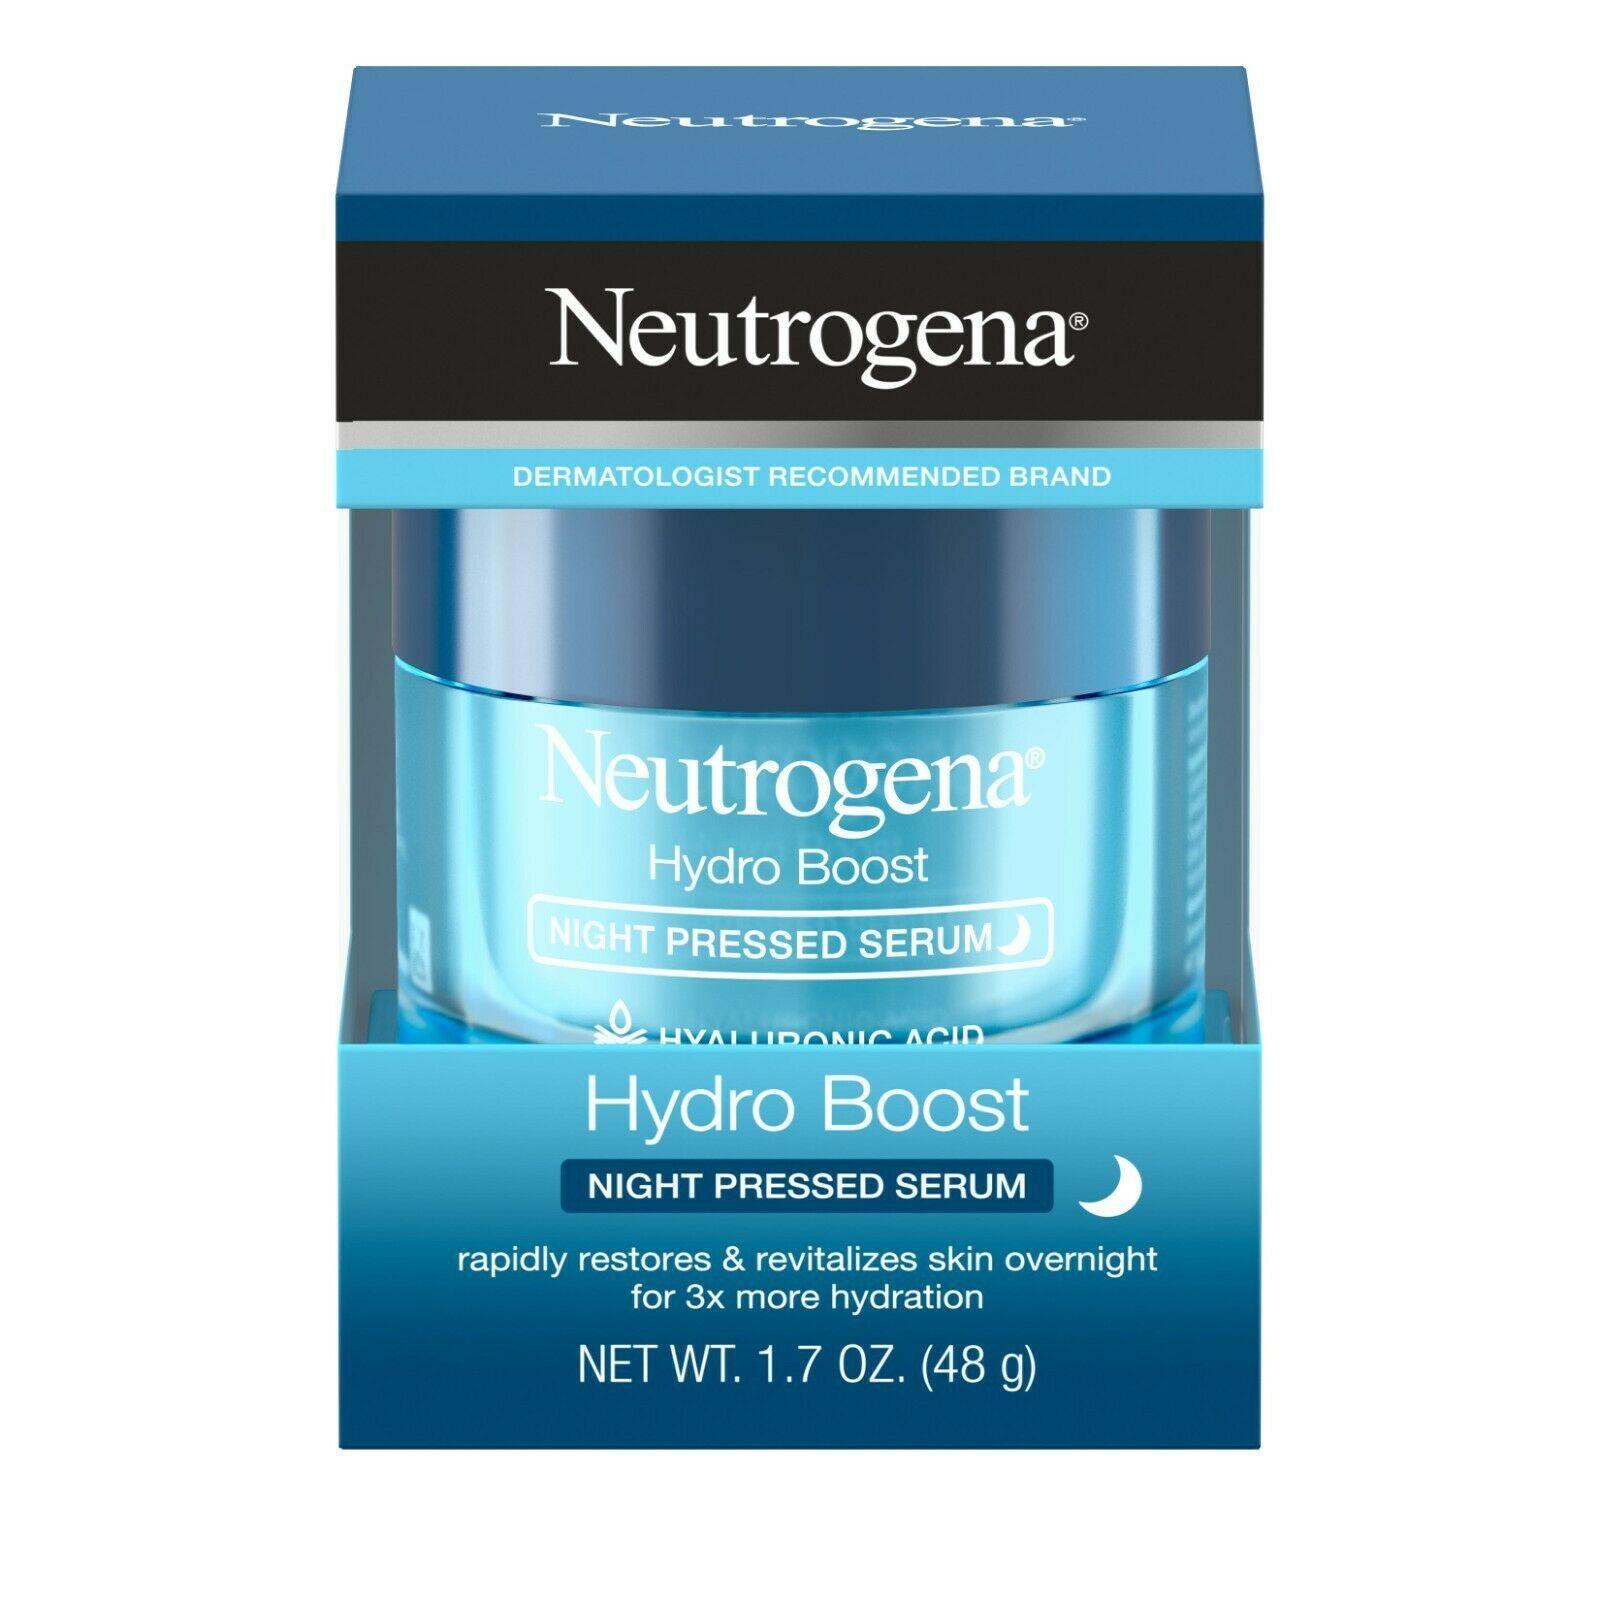 Neutrogena Hydro Boost Hyaluronic Acid Pressed Night Serum, 1.7 oz..+ - $39.59